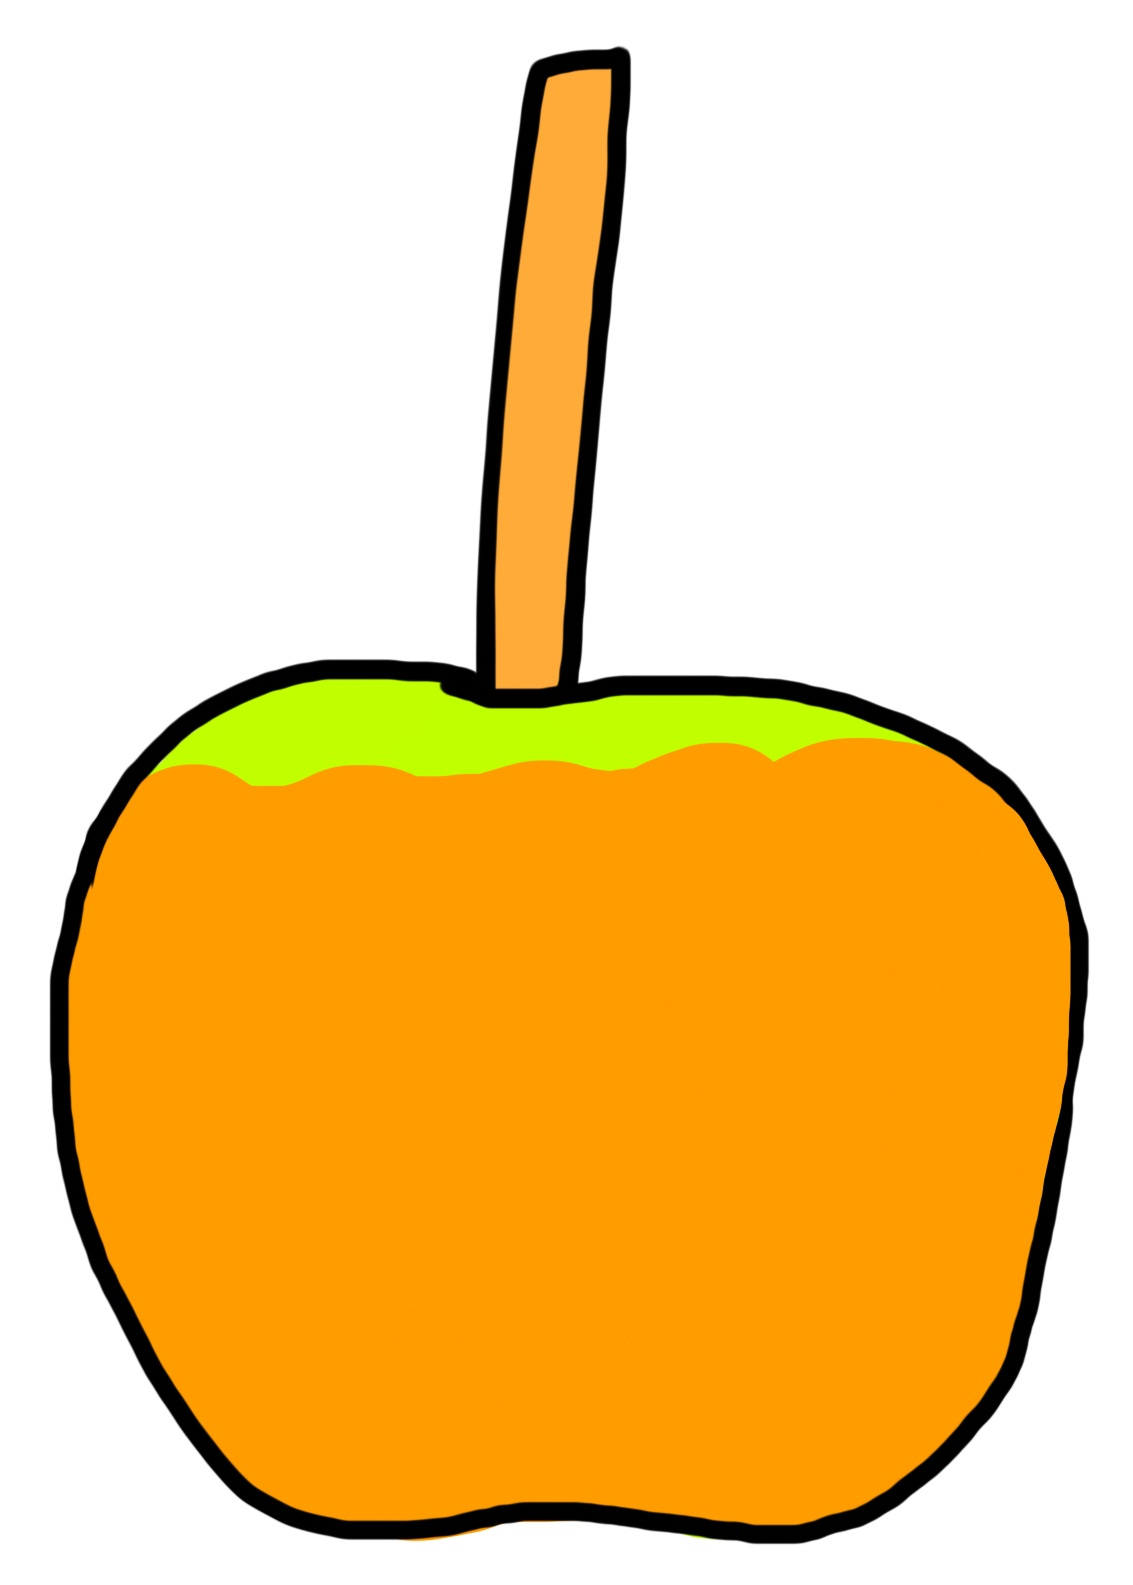 Caramel Apple Clip Art.